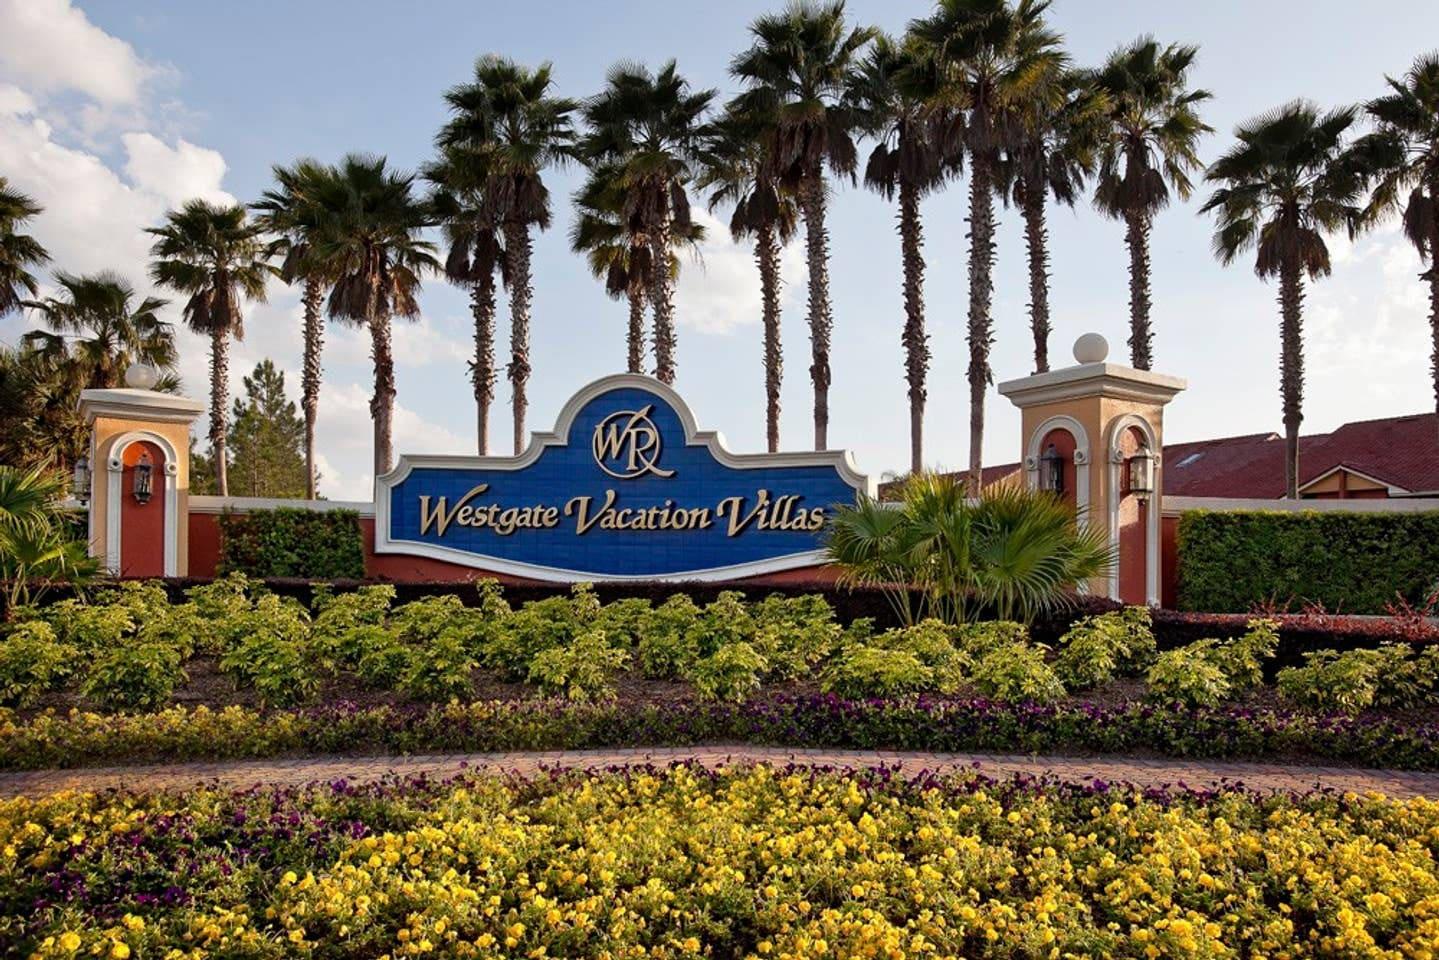 Westgate Town Center Resort 1 Bedroom Condo sleeps 4 just minutes from Disney